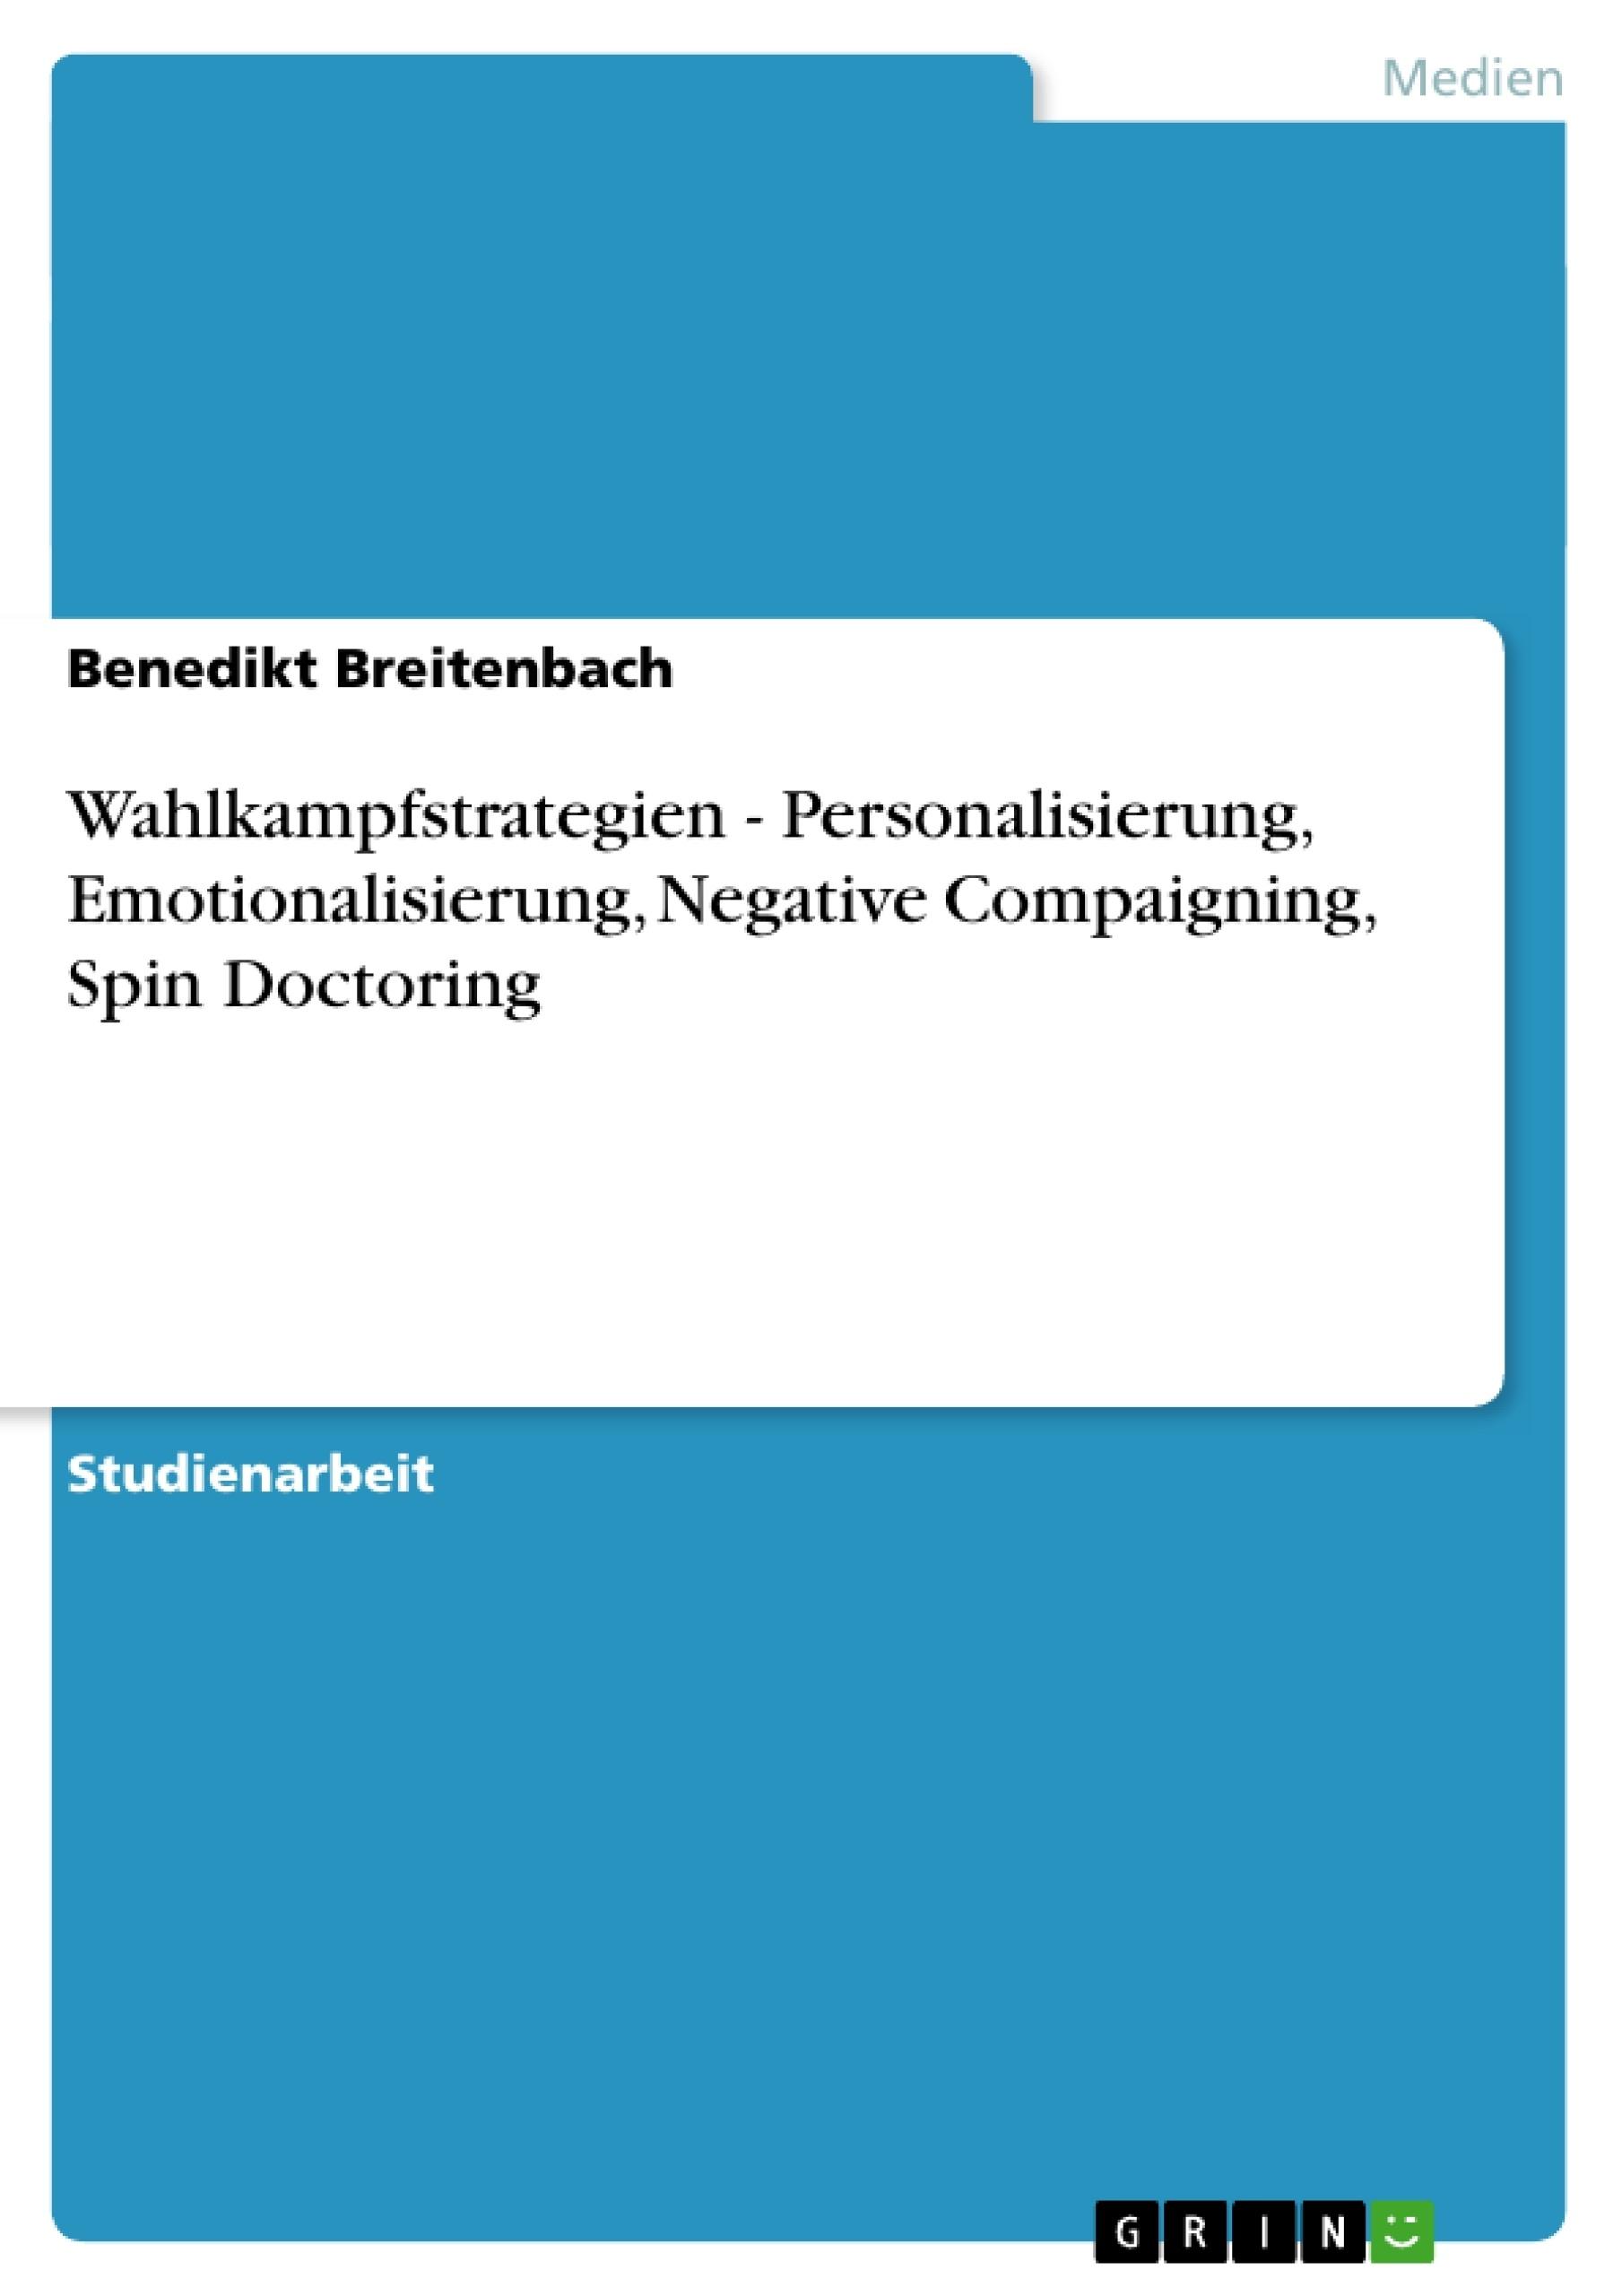 Titel: Wahlkampfstrategien - Personalisierung, Emotionalisierung, Negative Compaigning, Spin Doctoring